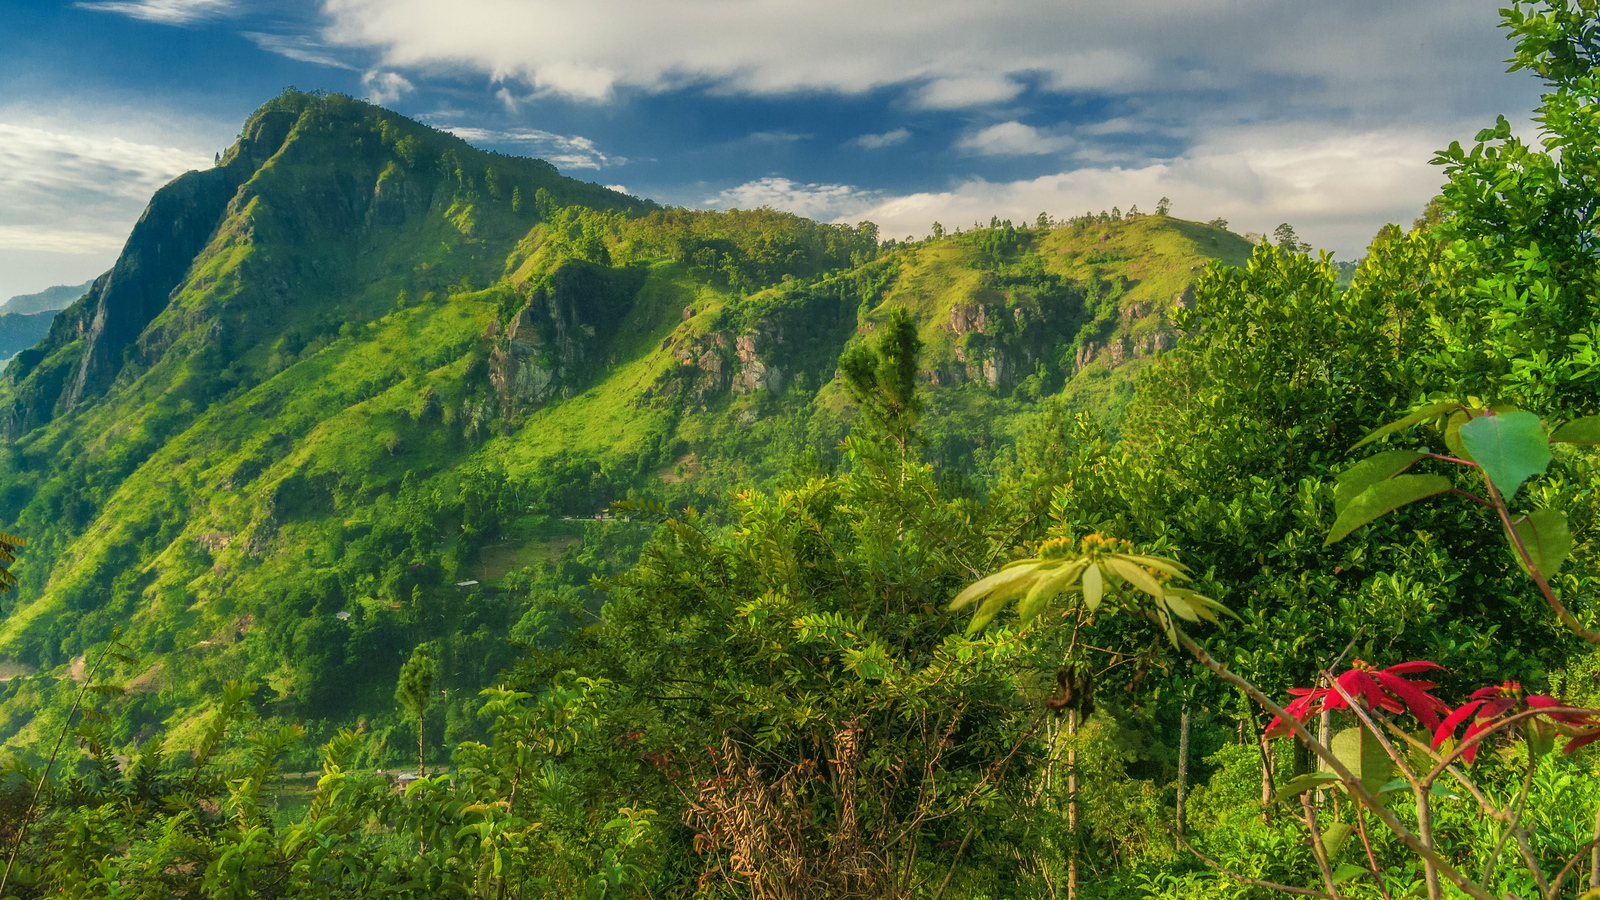 The Lush green hills of Central Sri Lanka